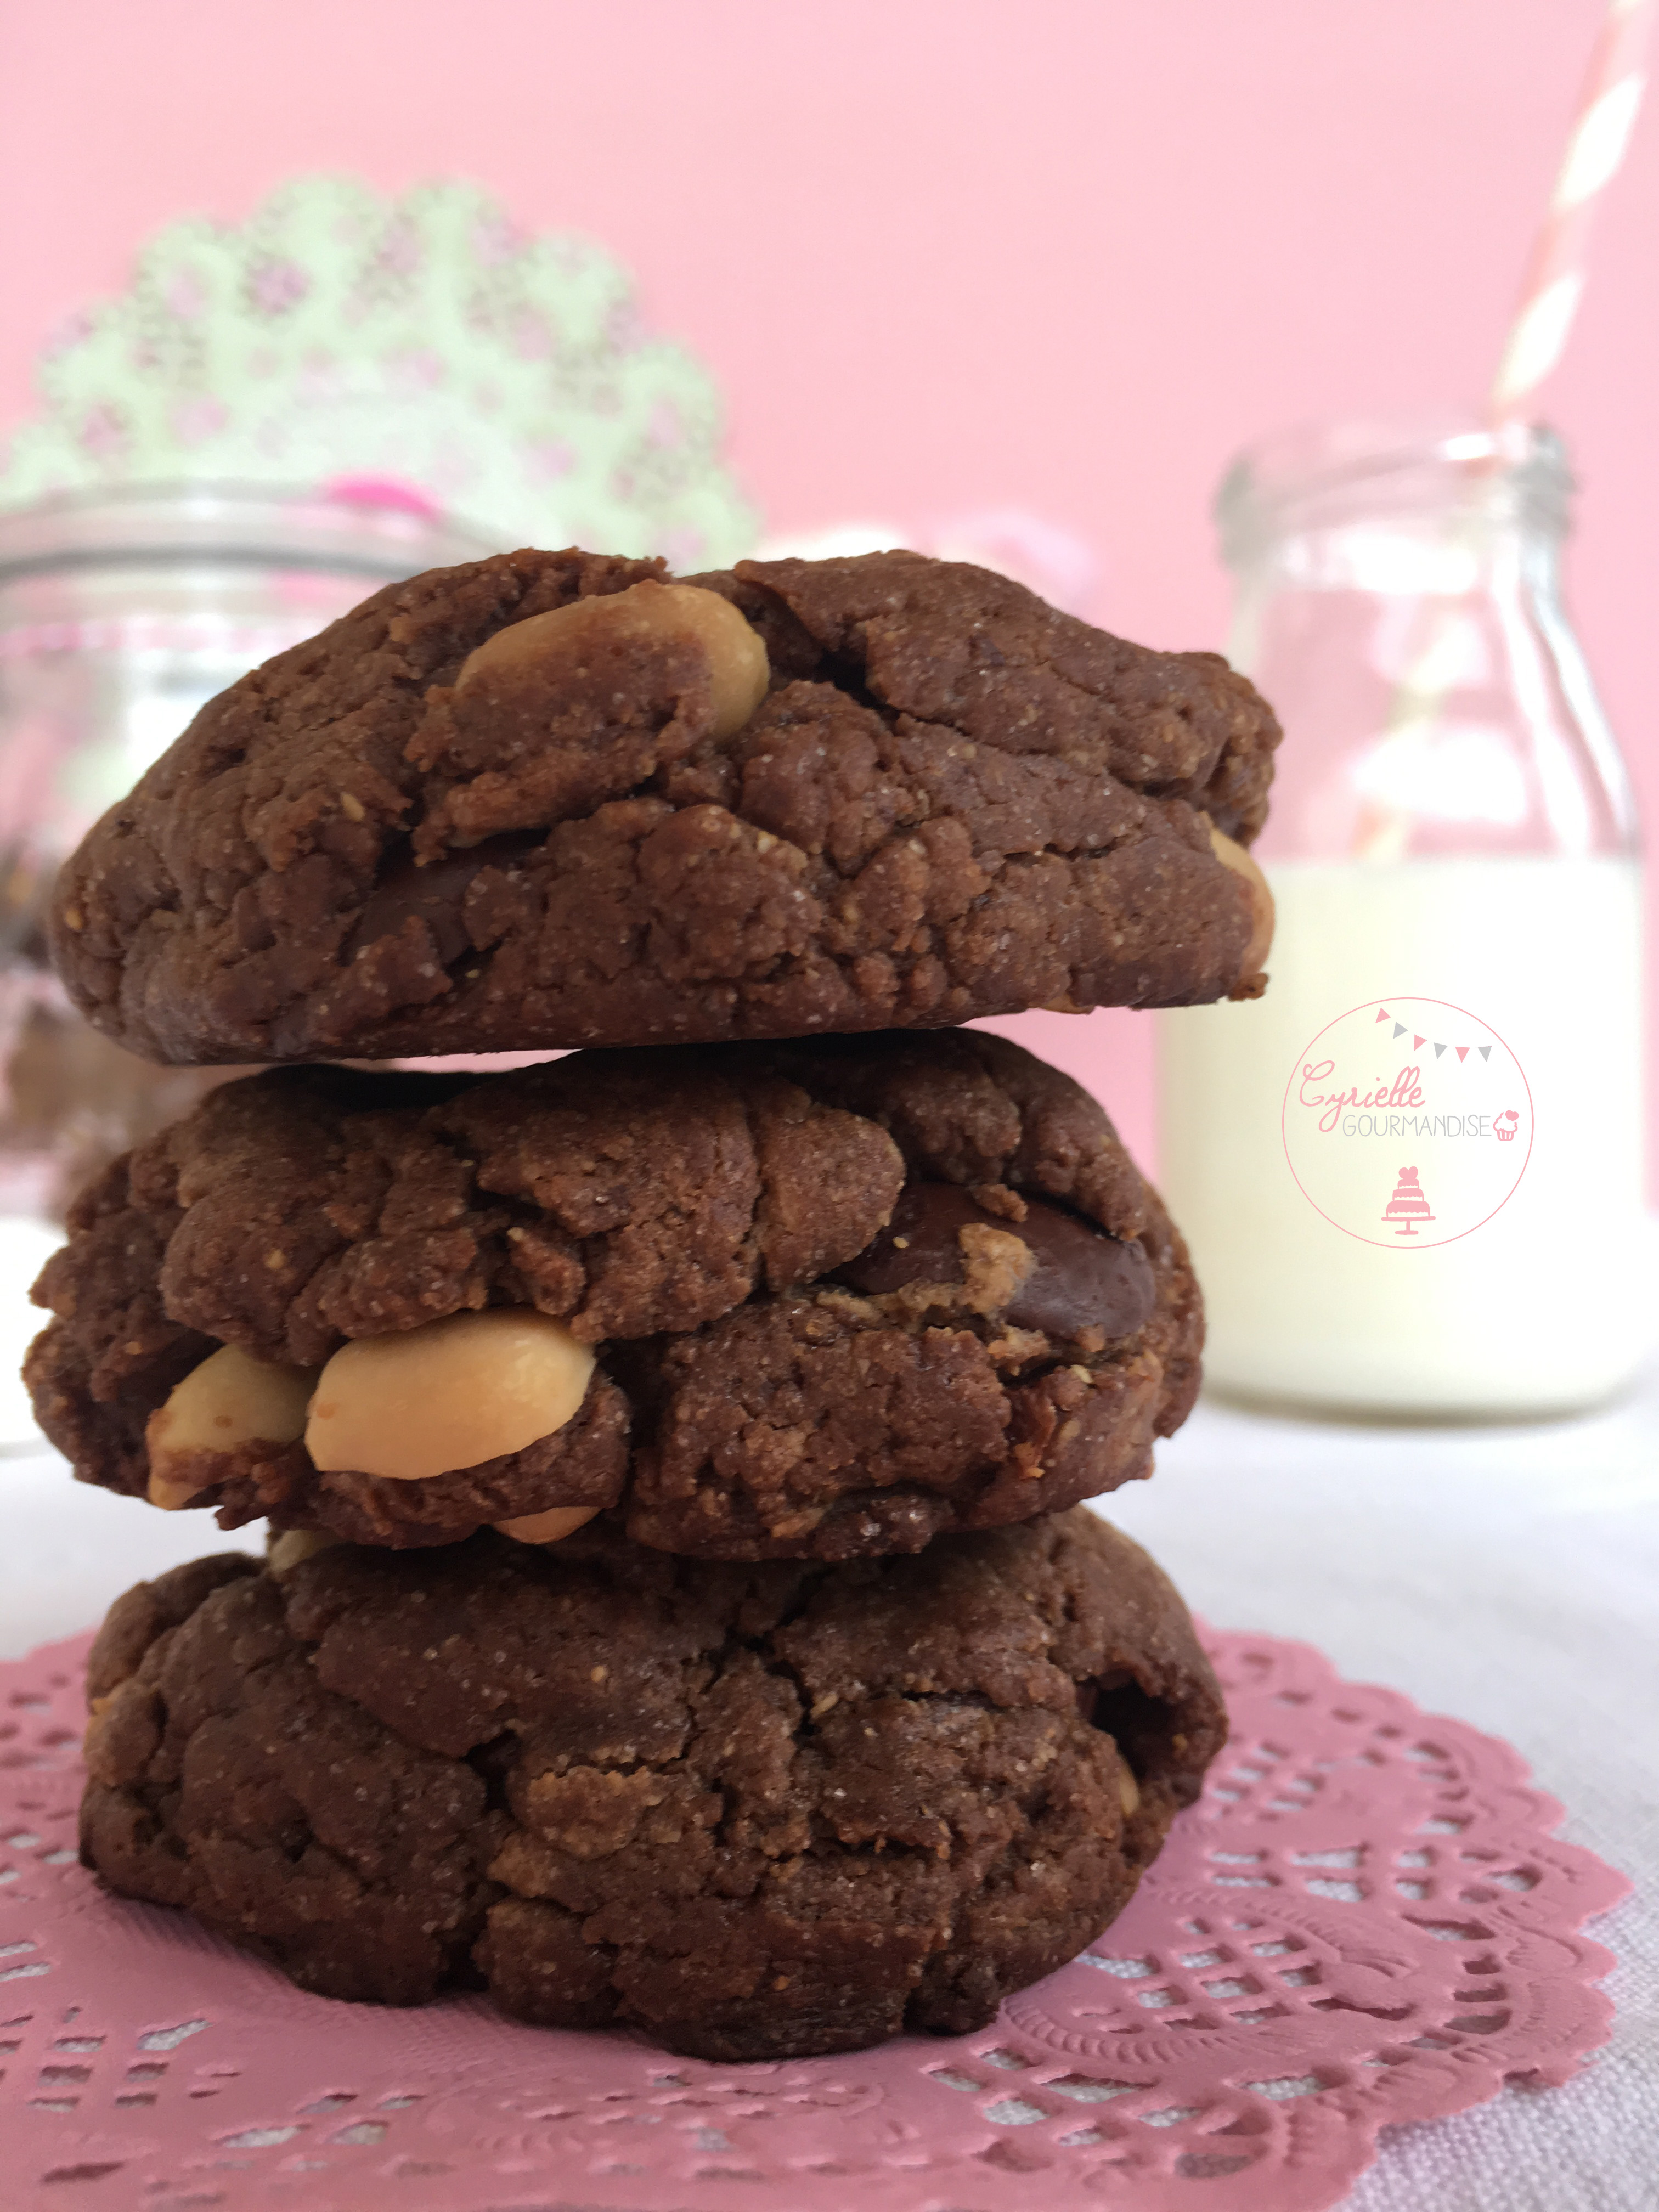 Cookies chocolat beurre de cacahu te cyrielle gourmandise - Cookies beurre de cacahuete ...